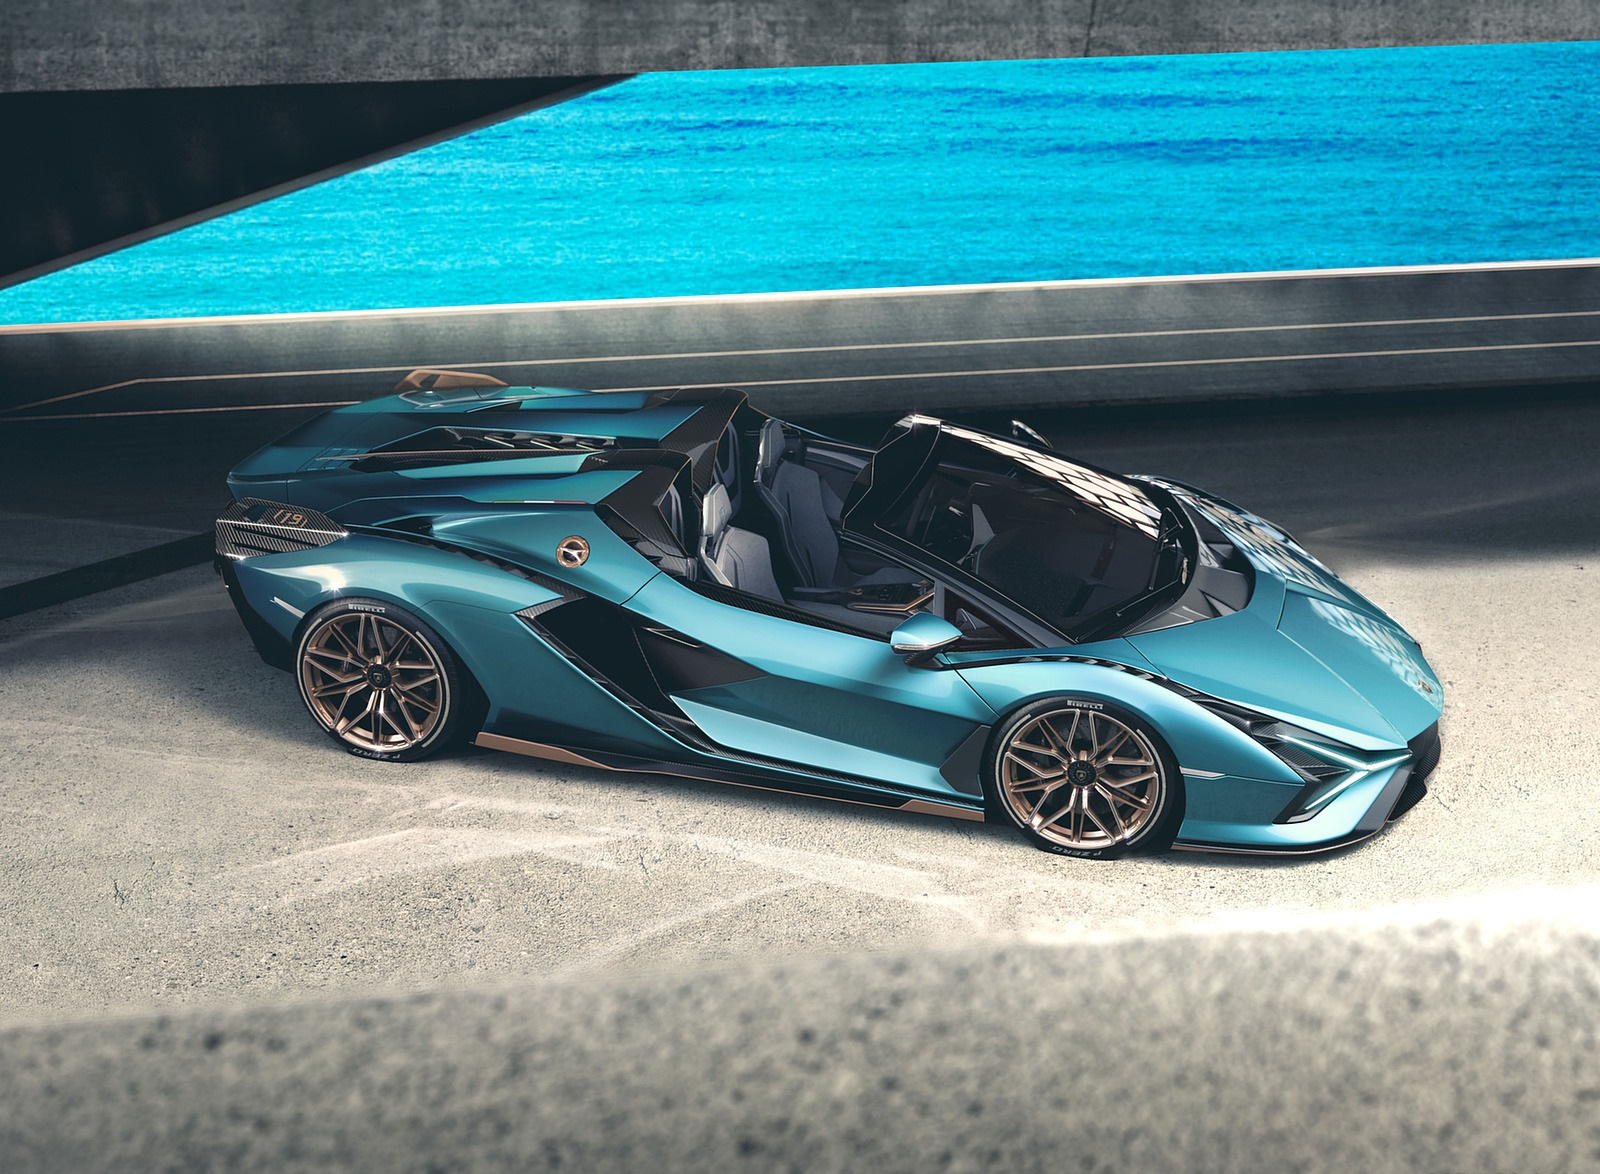 2021 Lamborghini Sián Roadster Side Wallpapers #5 of 19